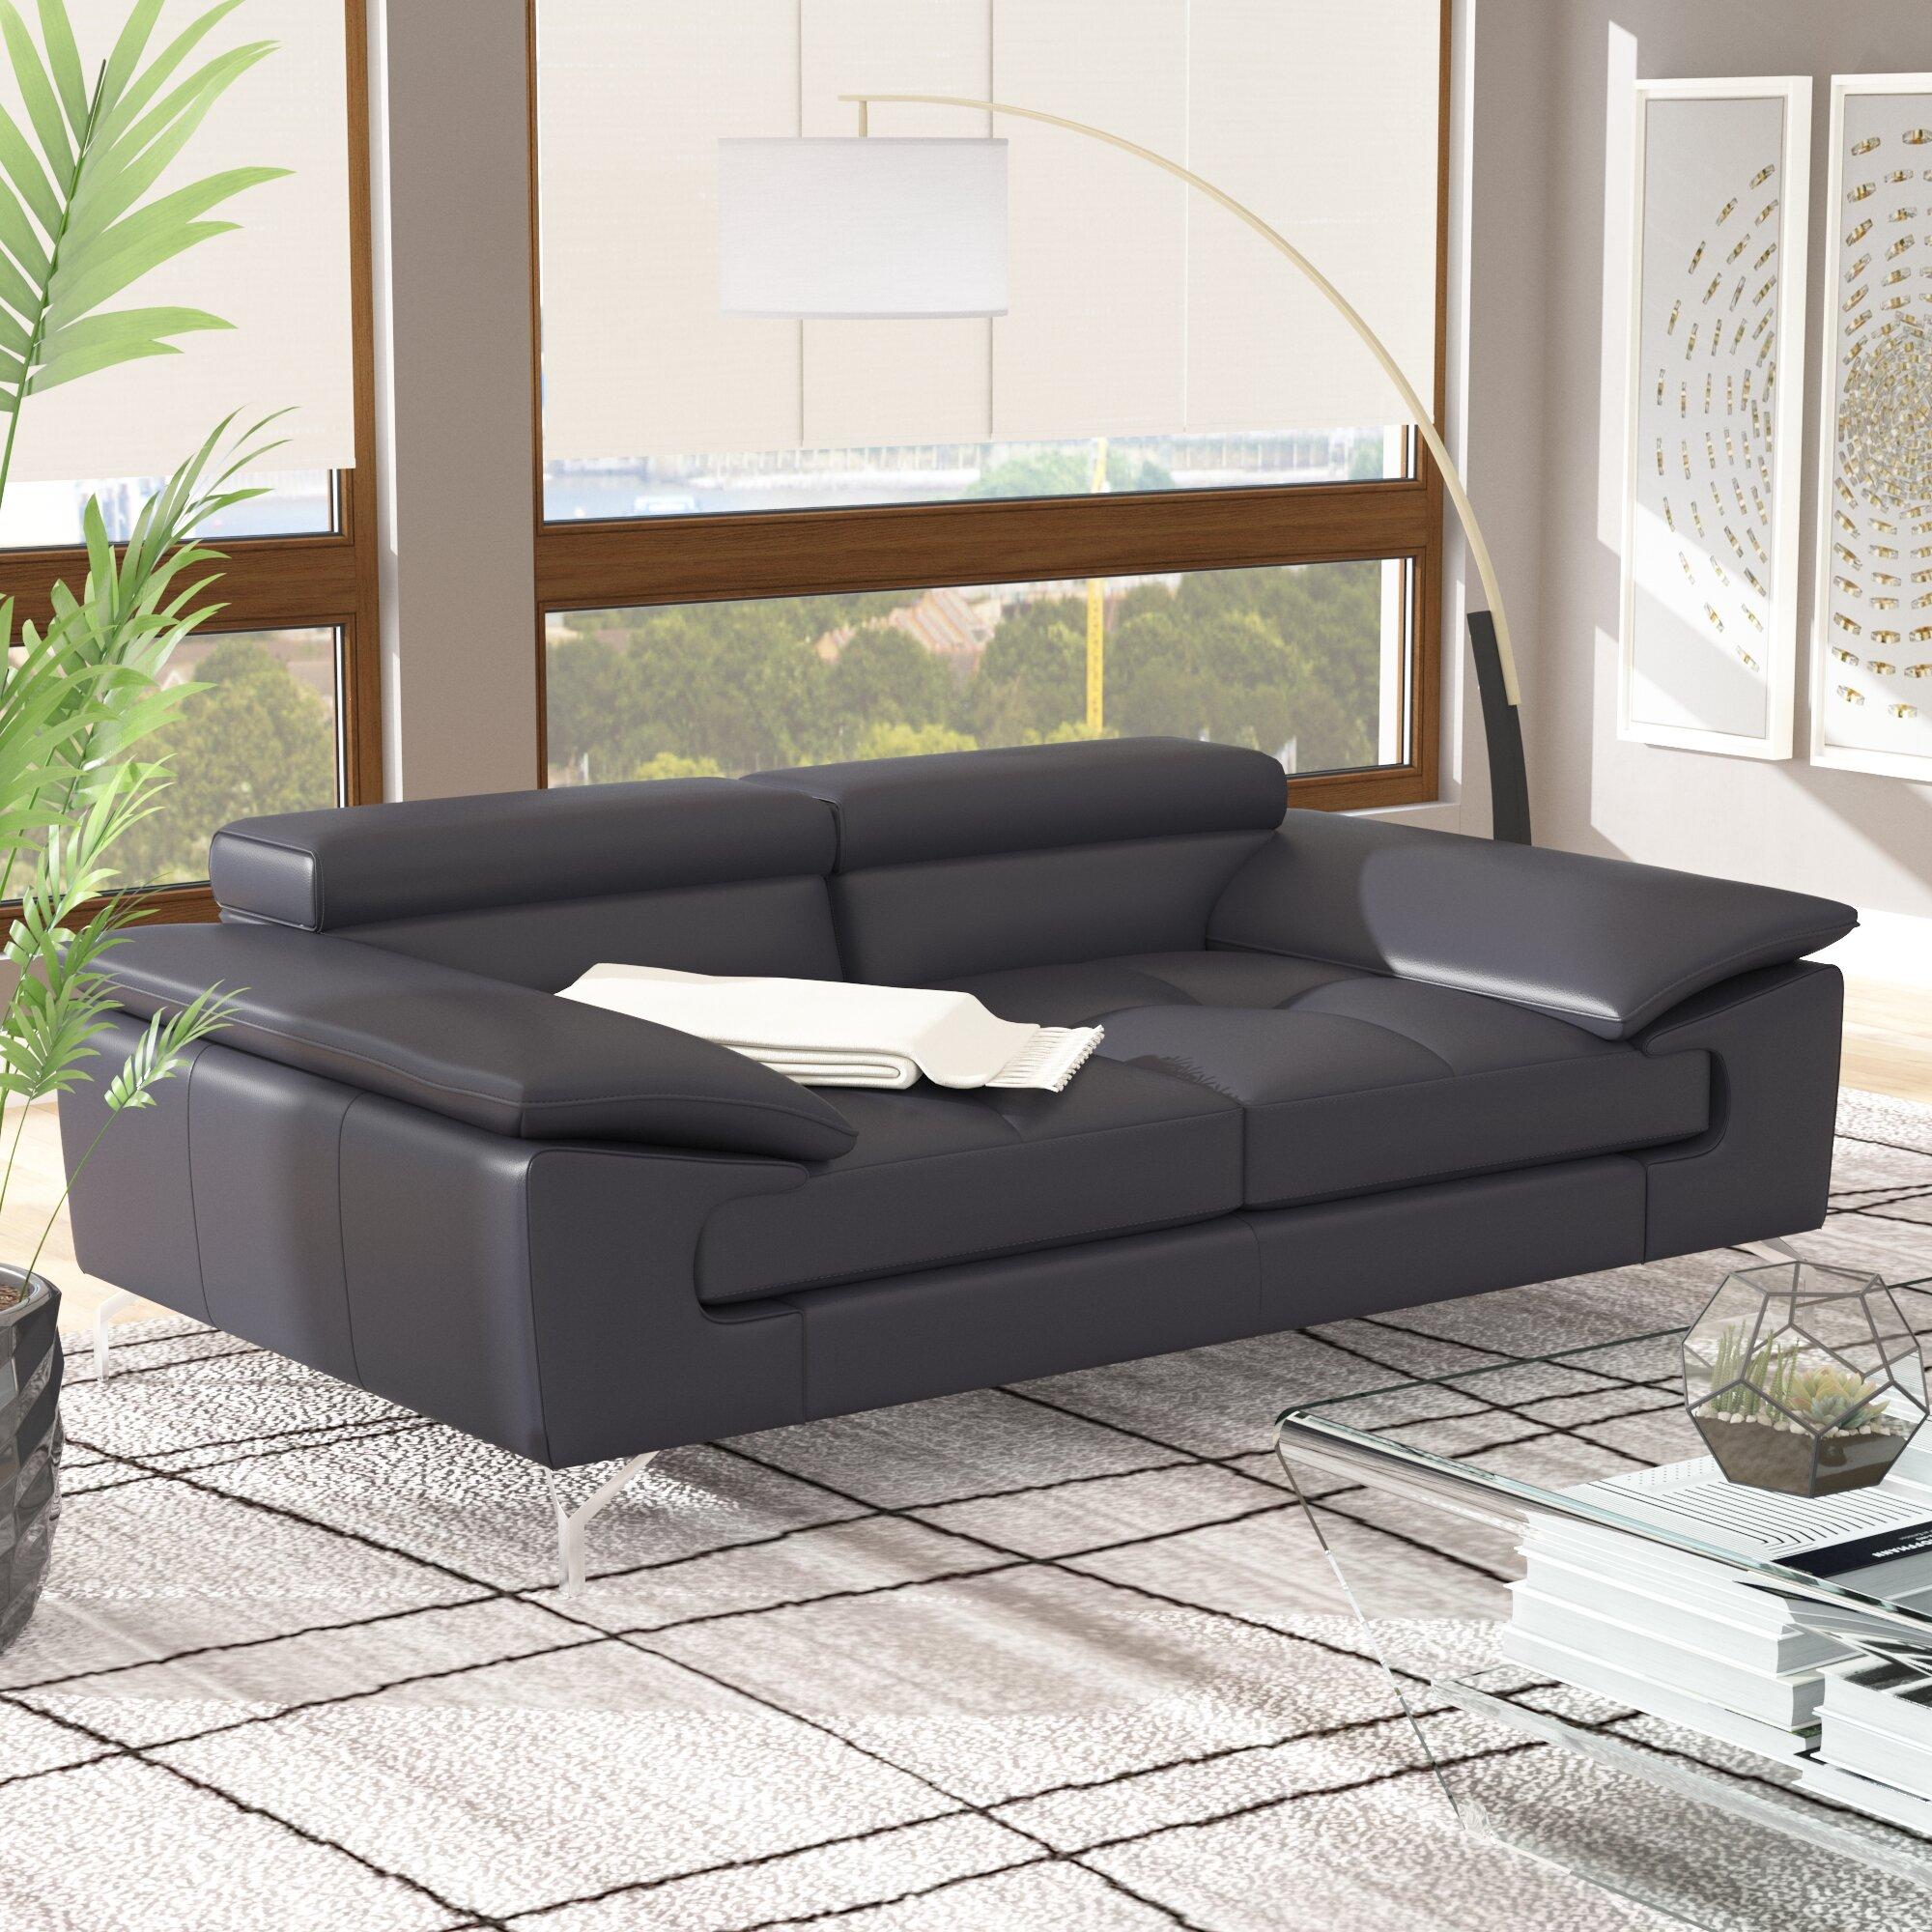 Colwyn Italian Leather Modular Loveseat